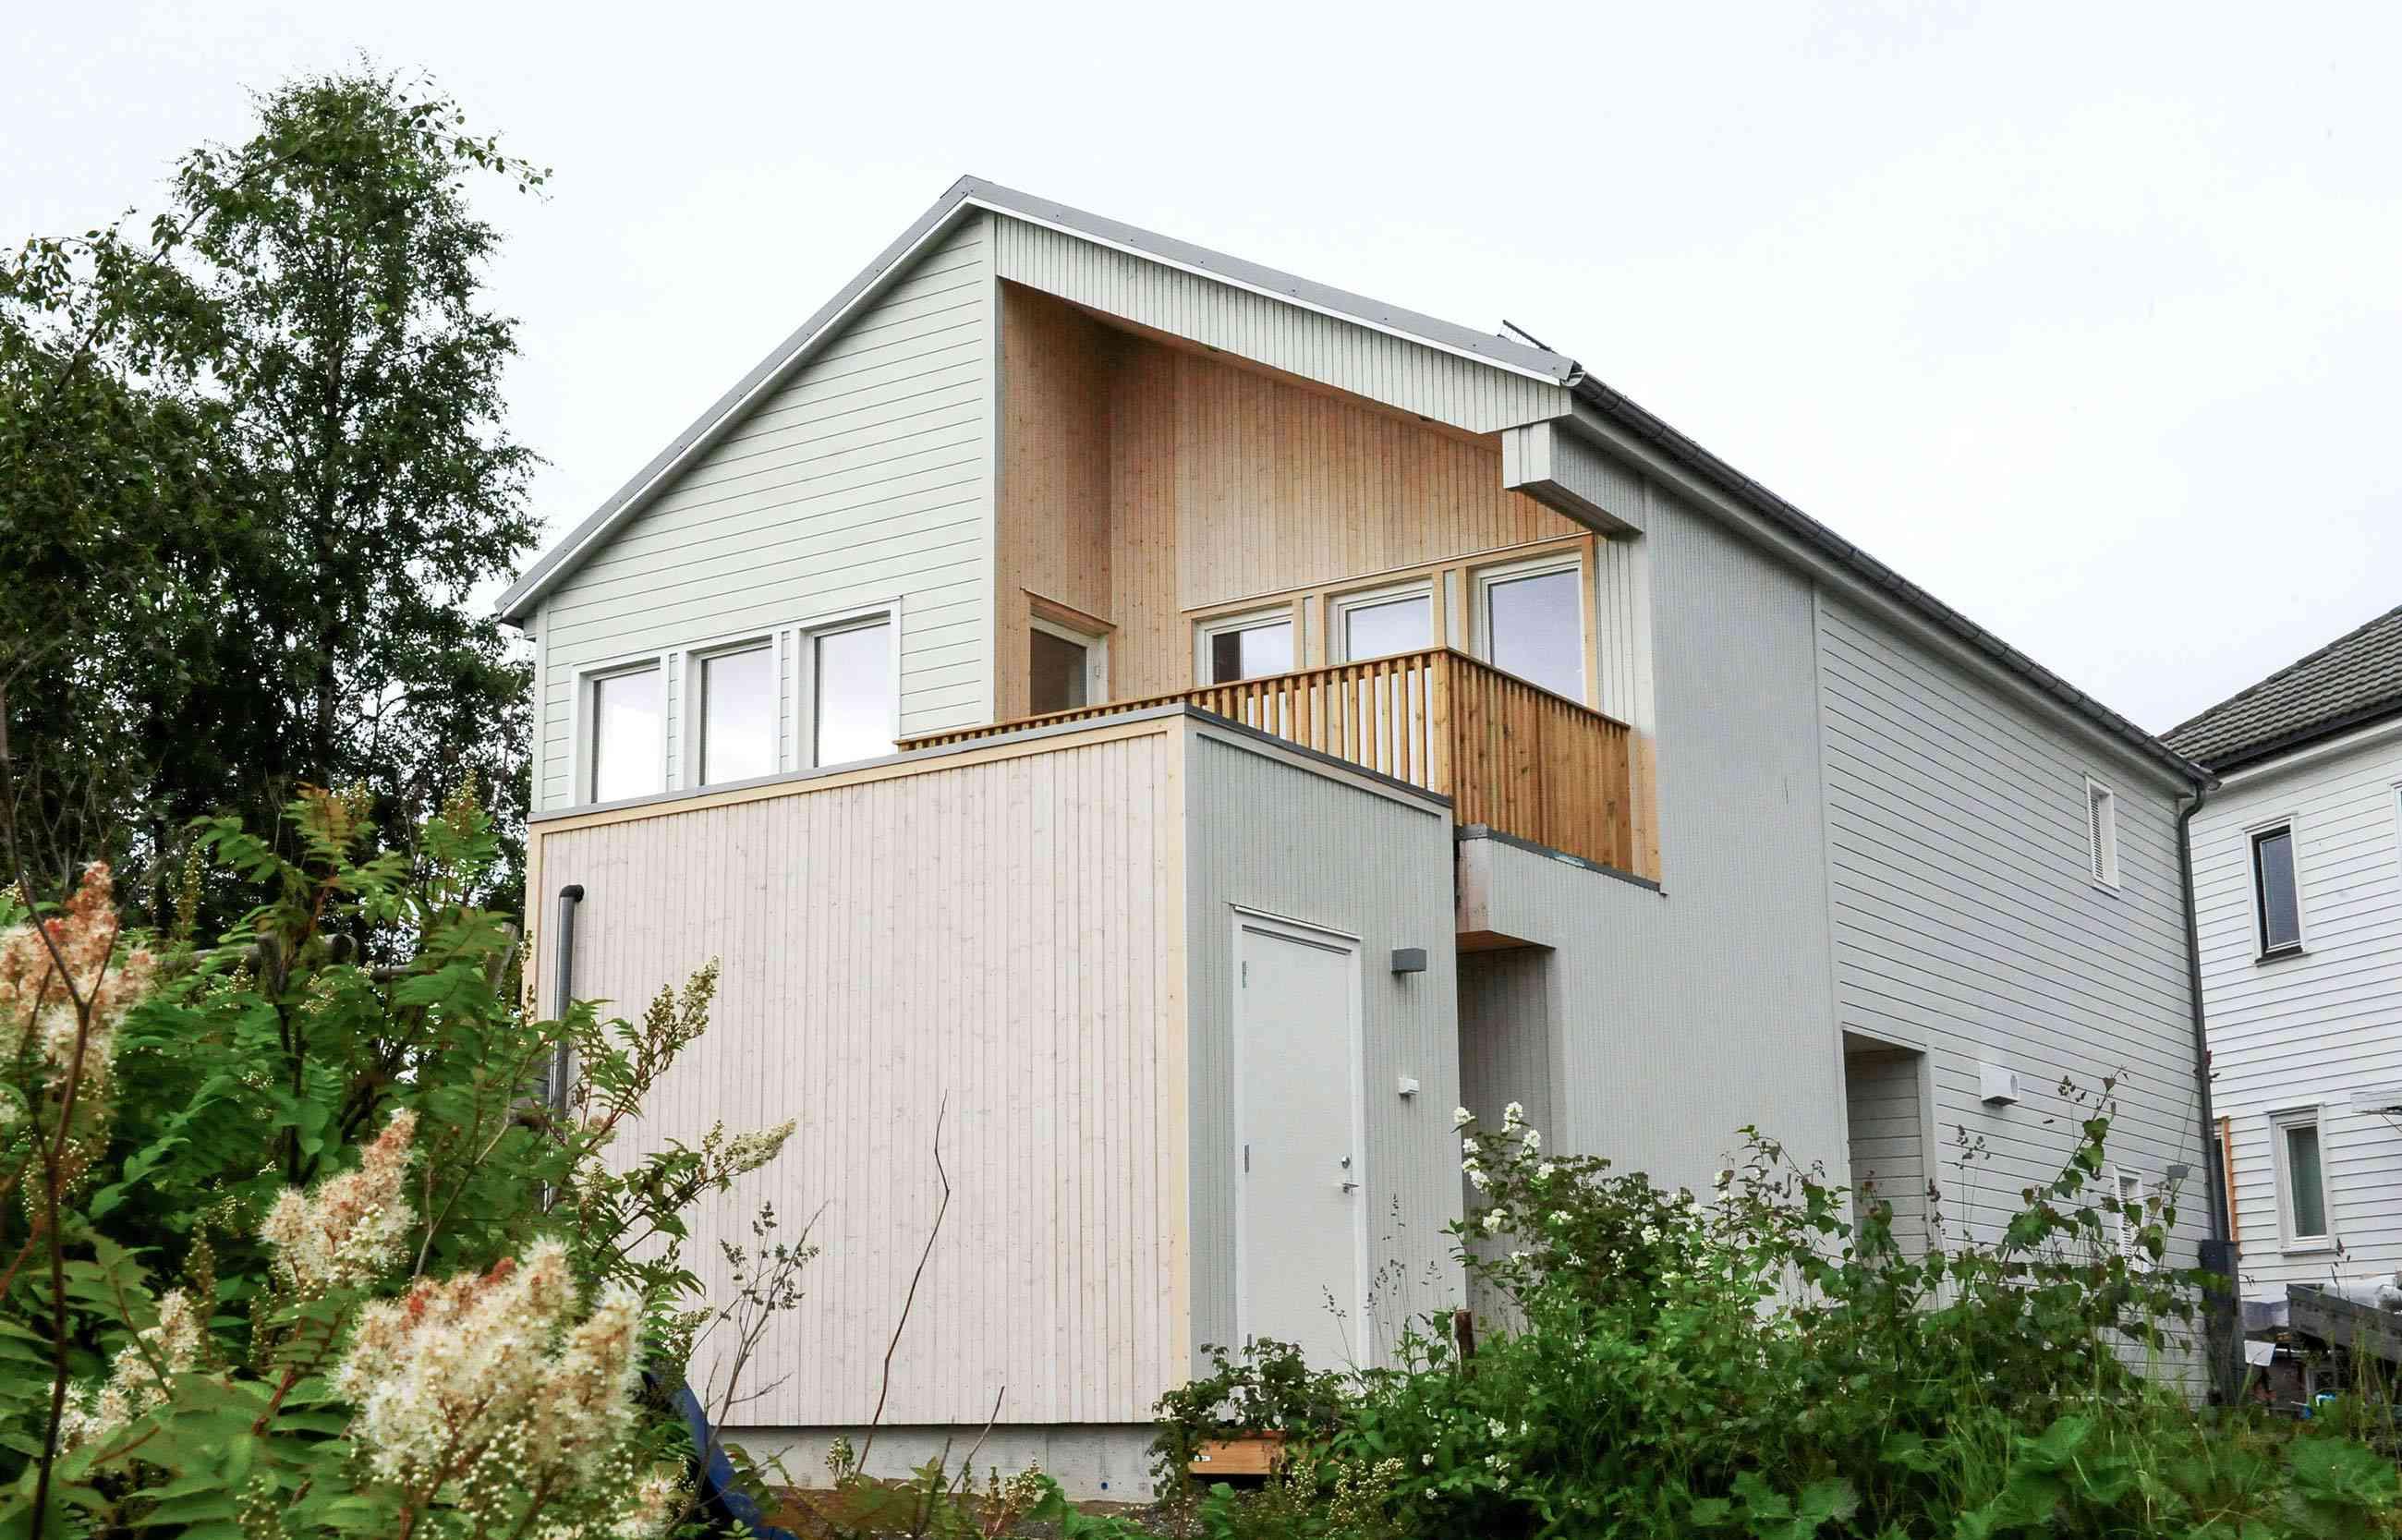 Stort hus med eplehage. Foto.